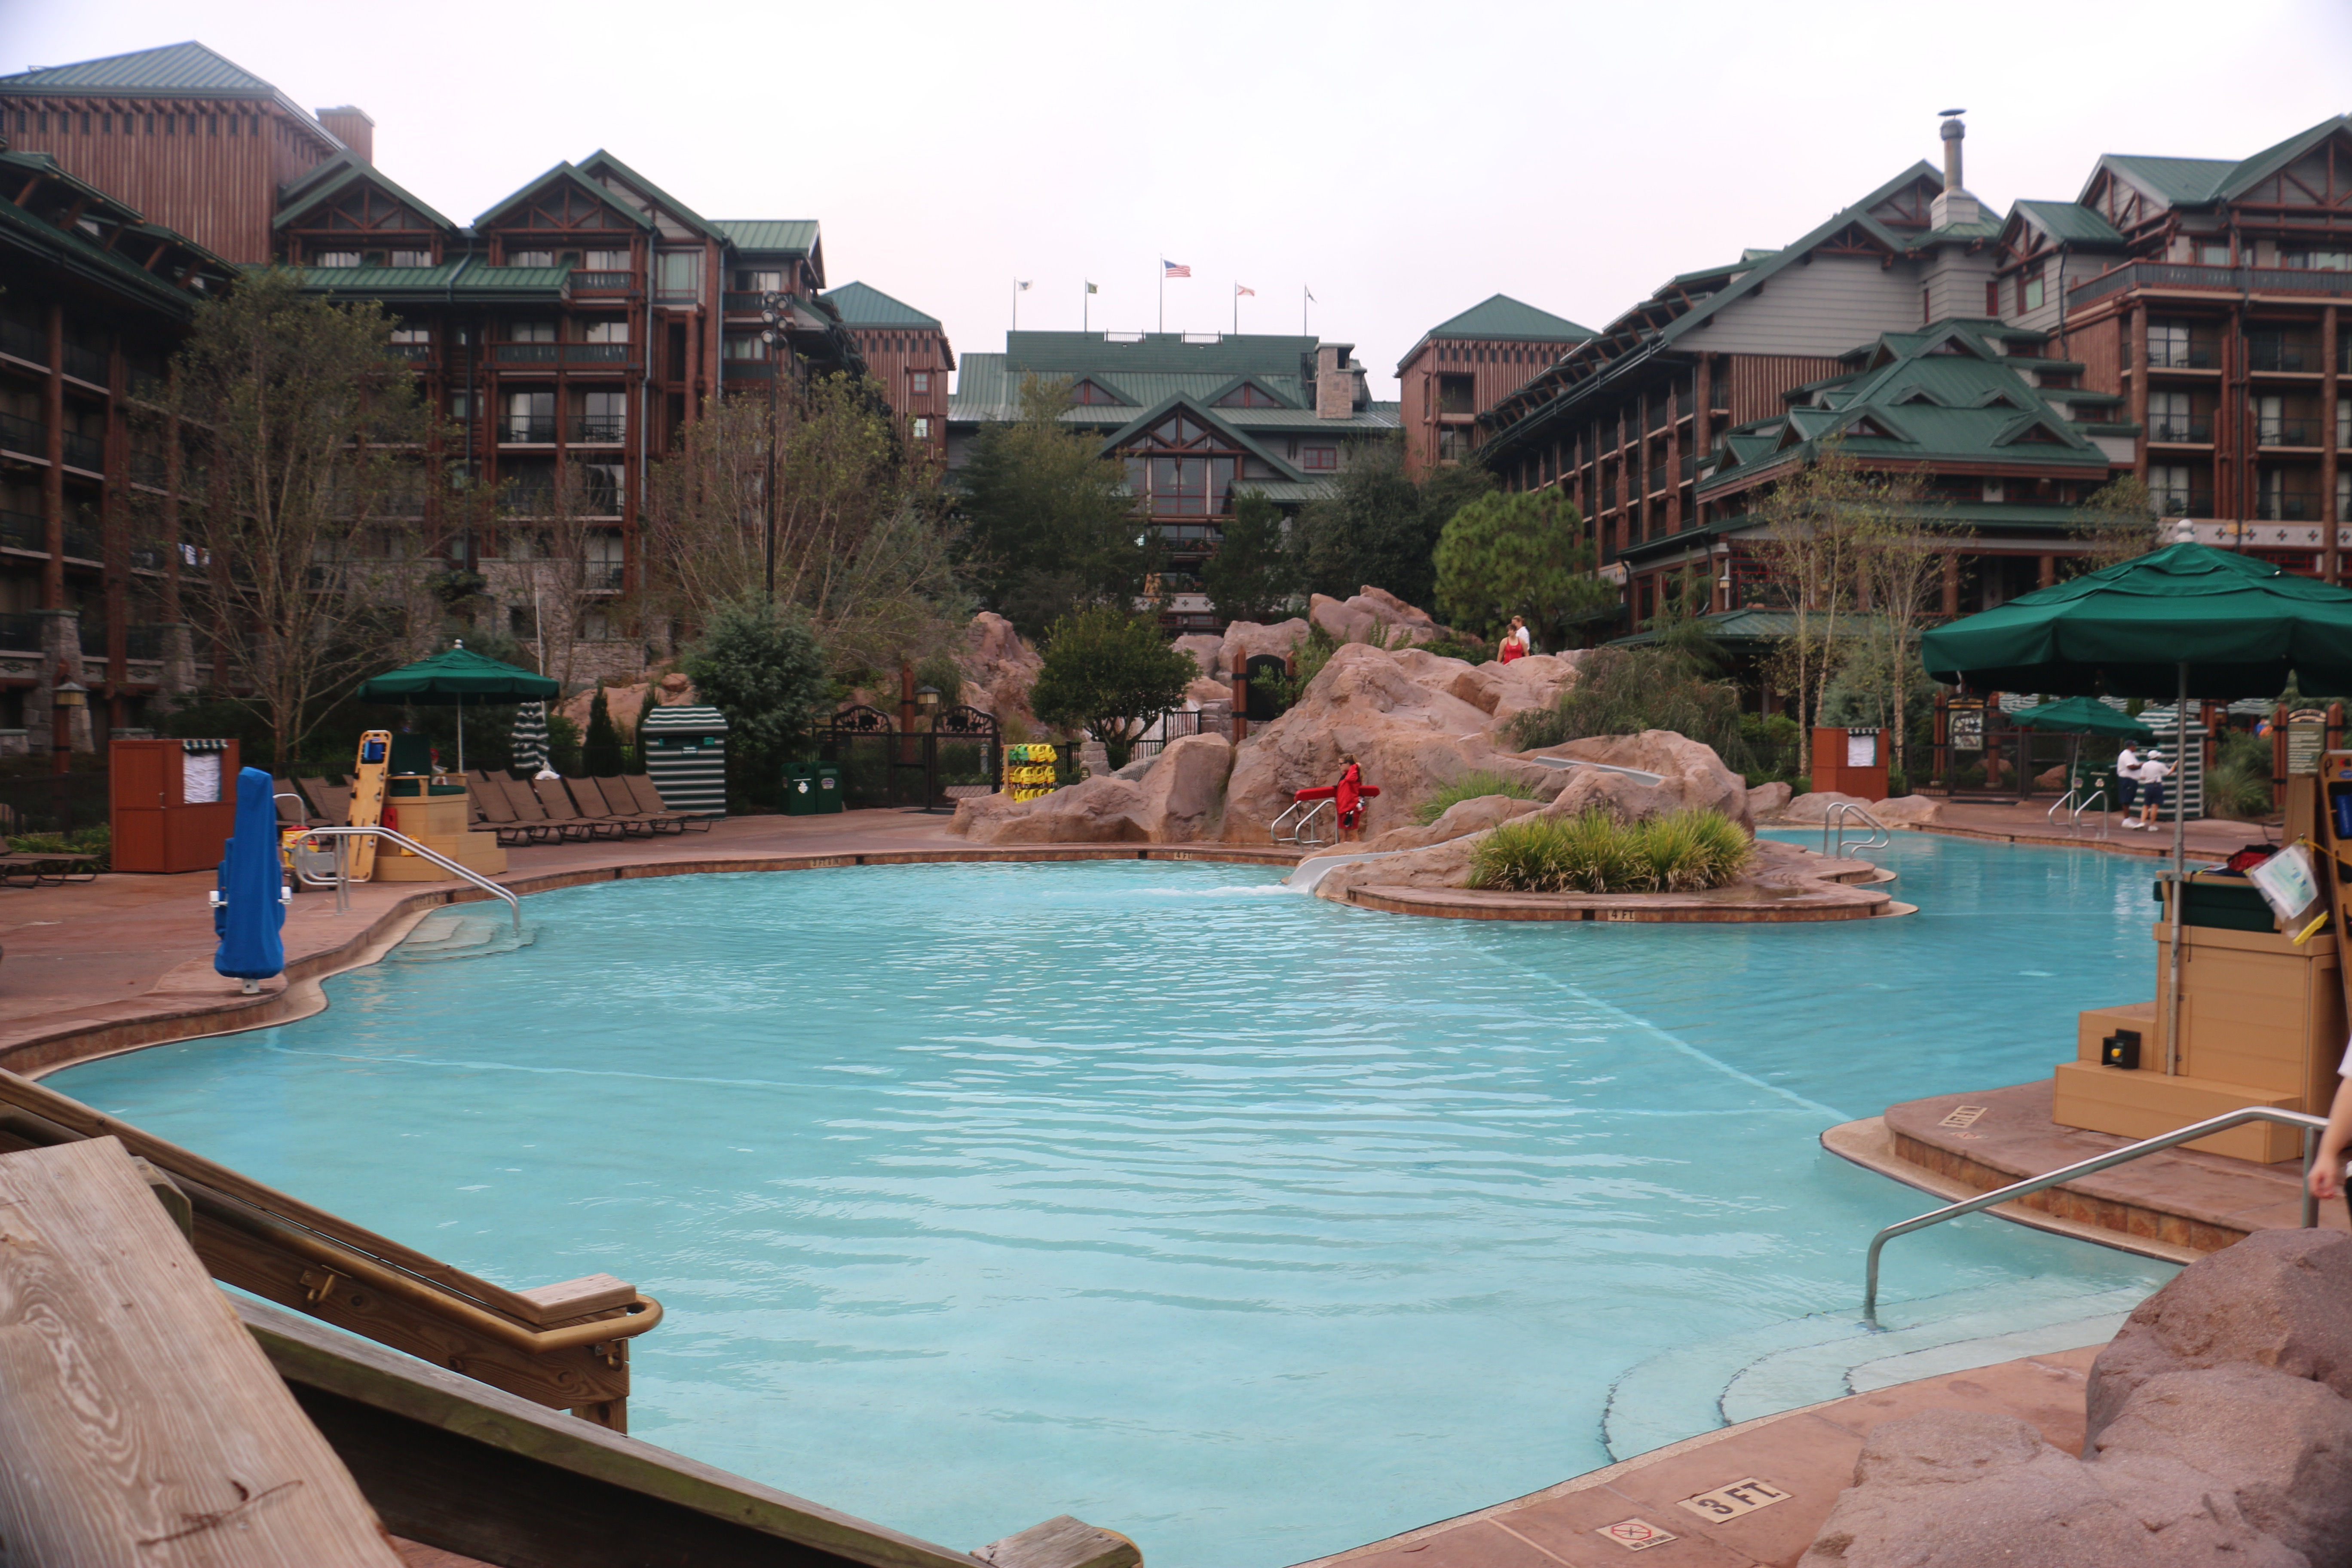 Wilderness Lodge Construction Update - TouringPlans.com Blog